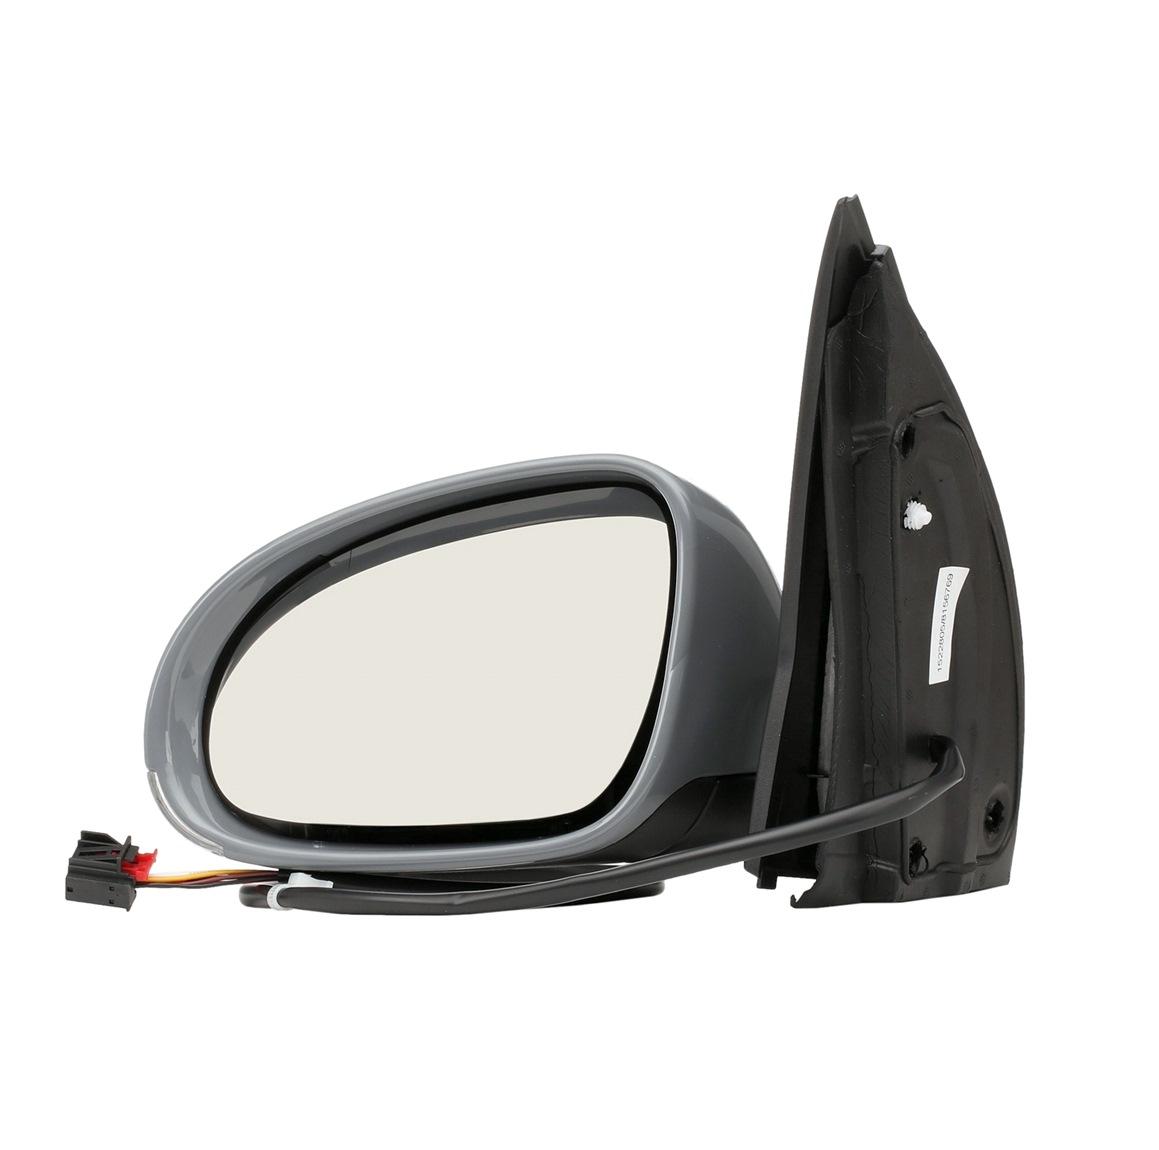 Backspegel 50O0035 RIDEX — bara nya delar